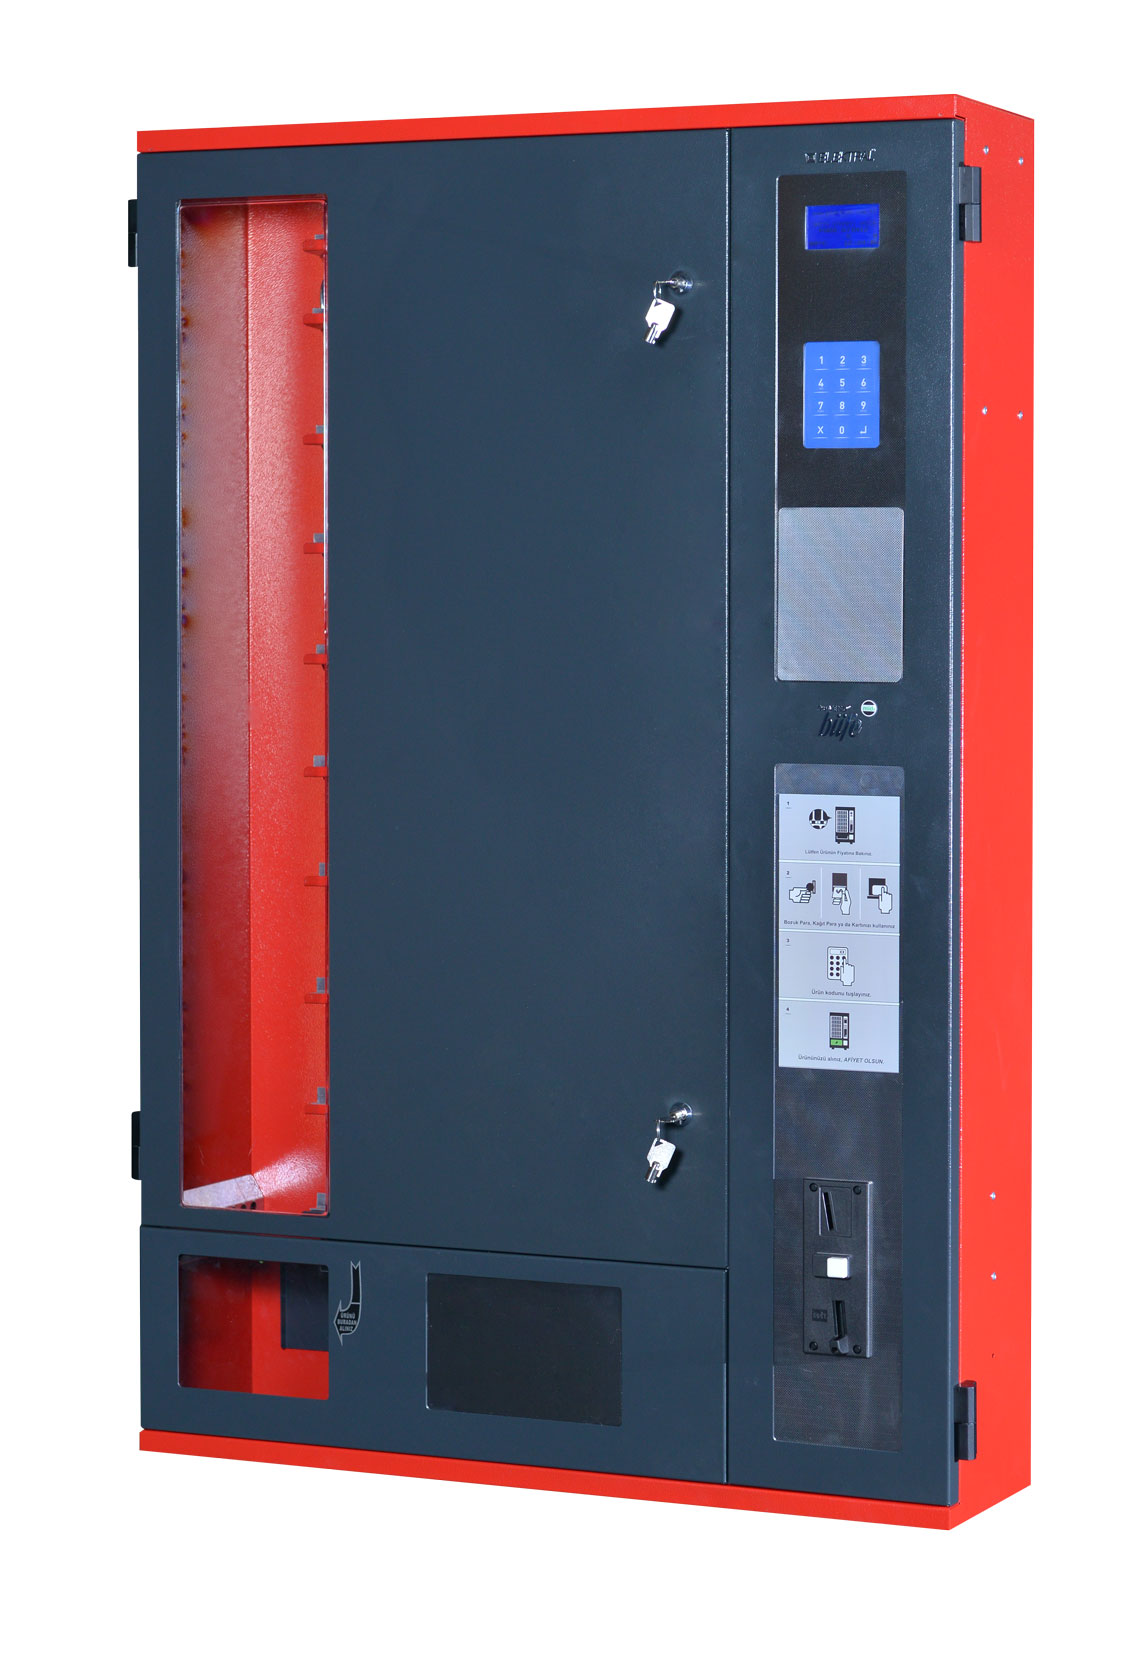 Slim Line Multi-Purpose Spiral Vending Machine